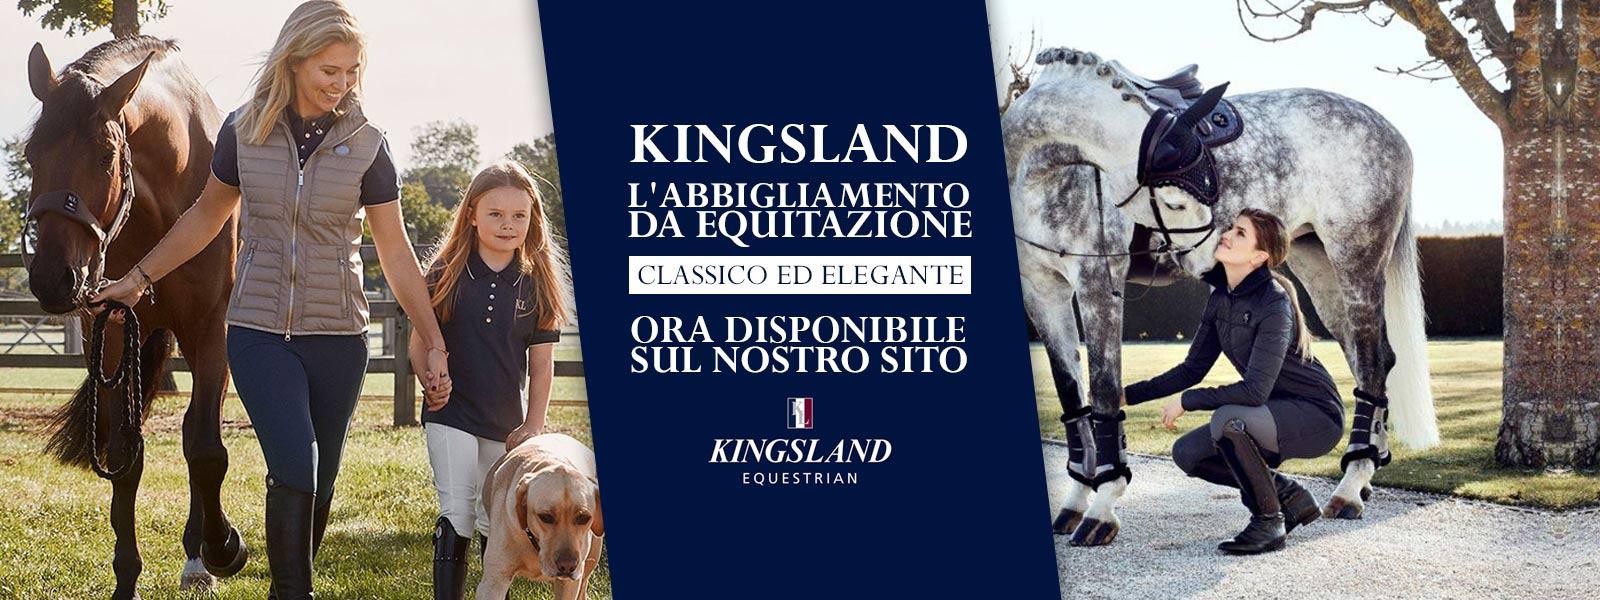 KINGSLAND SOSPESA